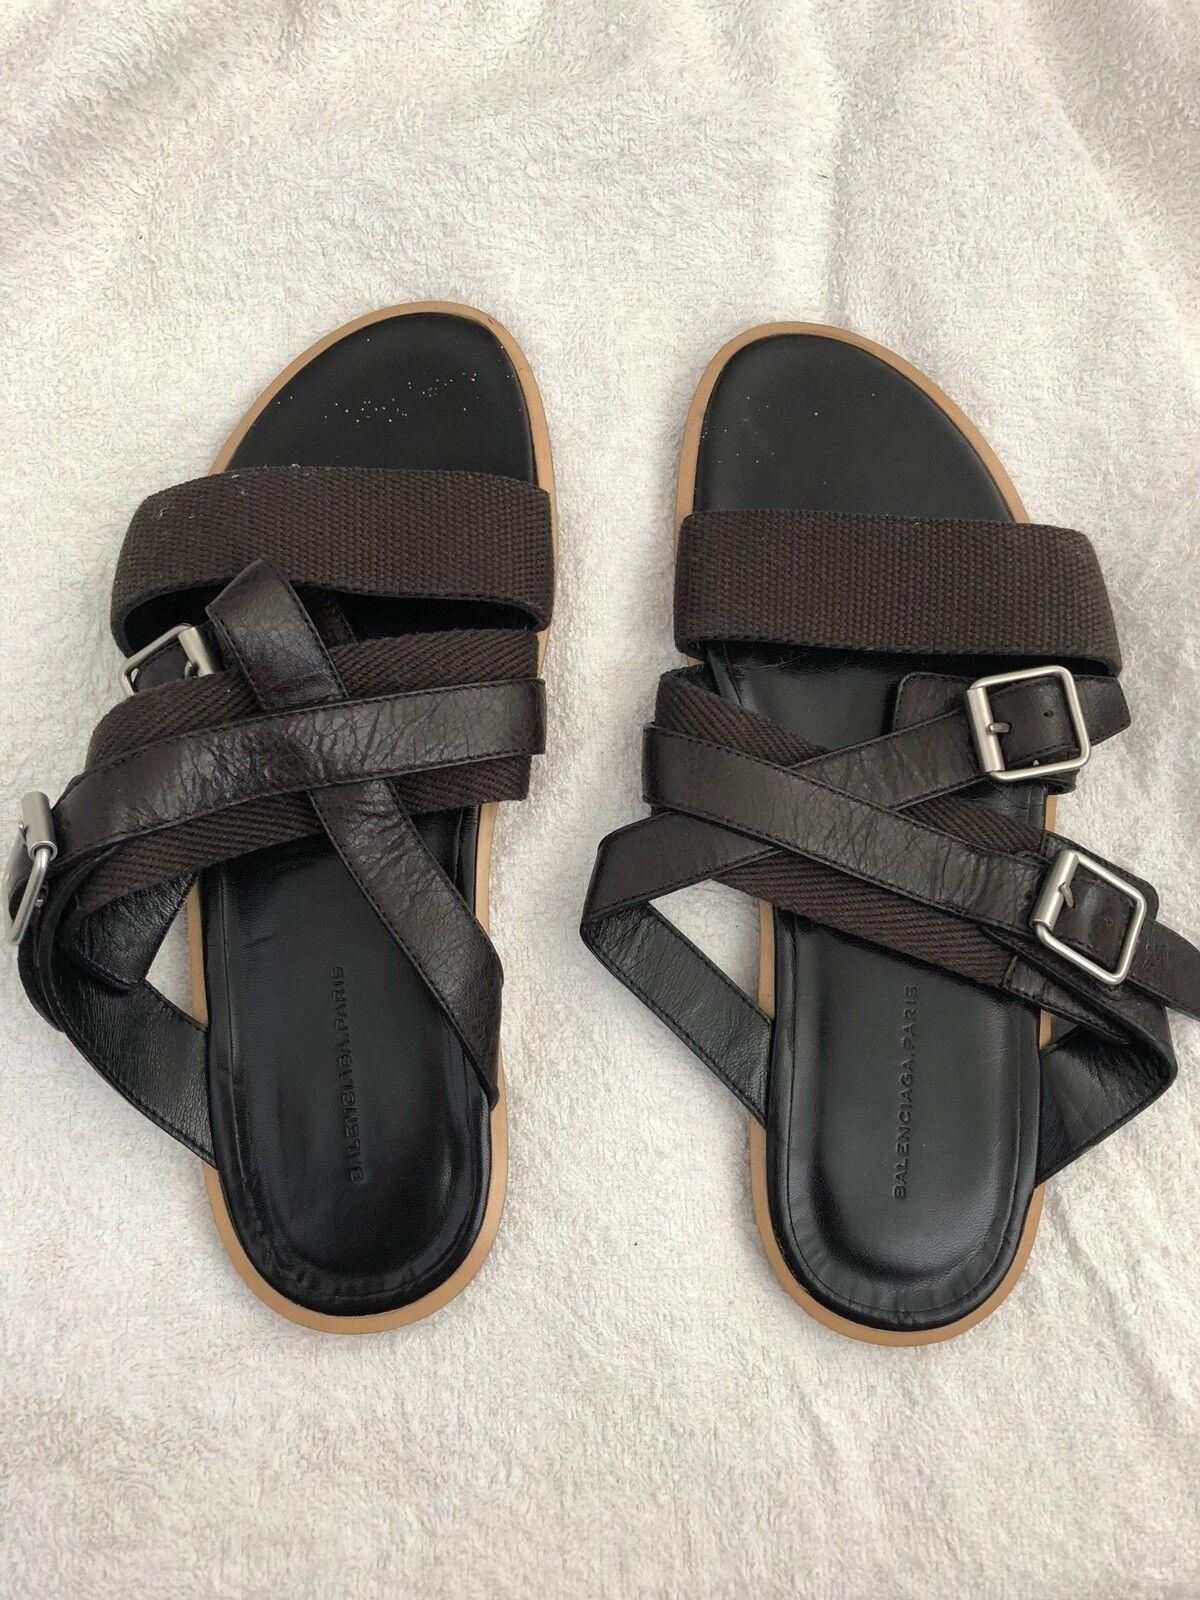 Man/Woman Balenciaga Sandals Packaging diversity excellent Great choice